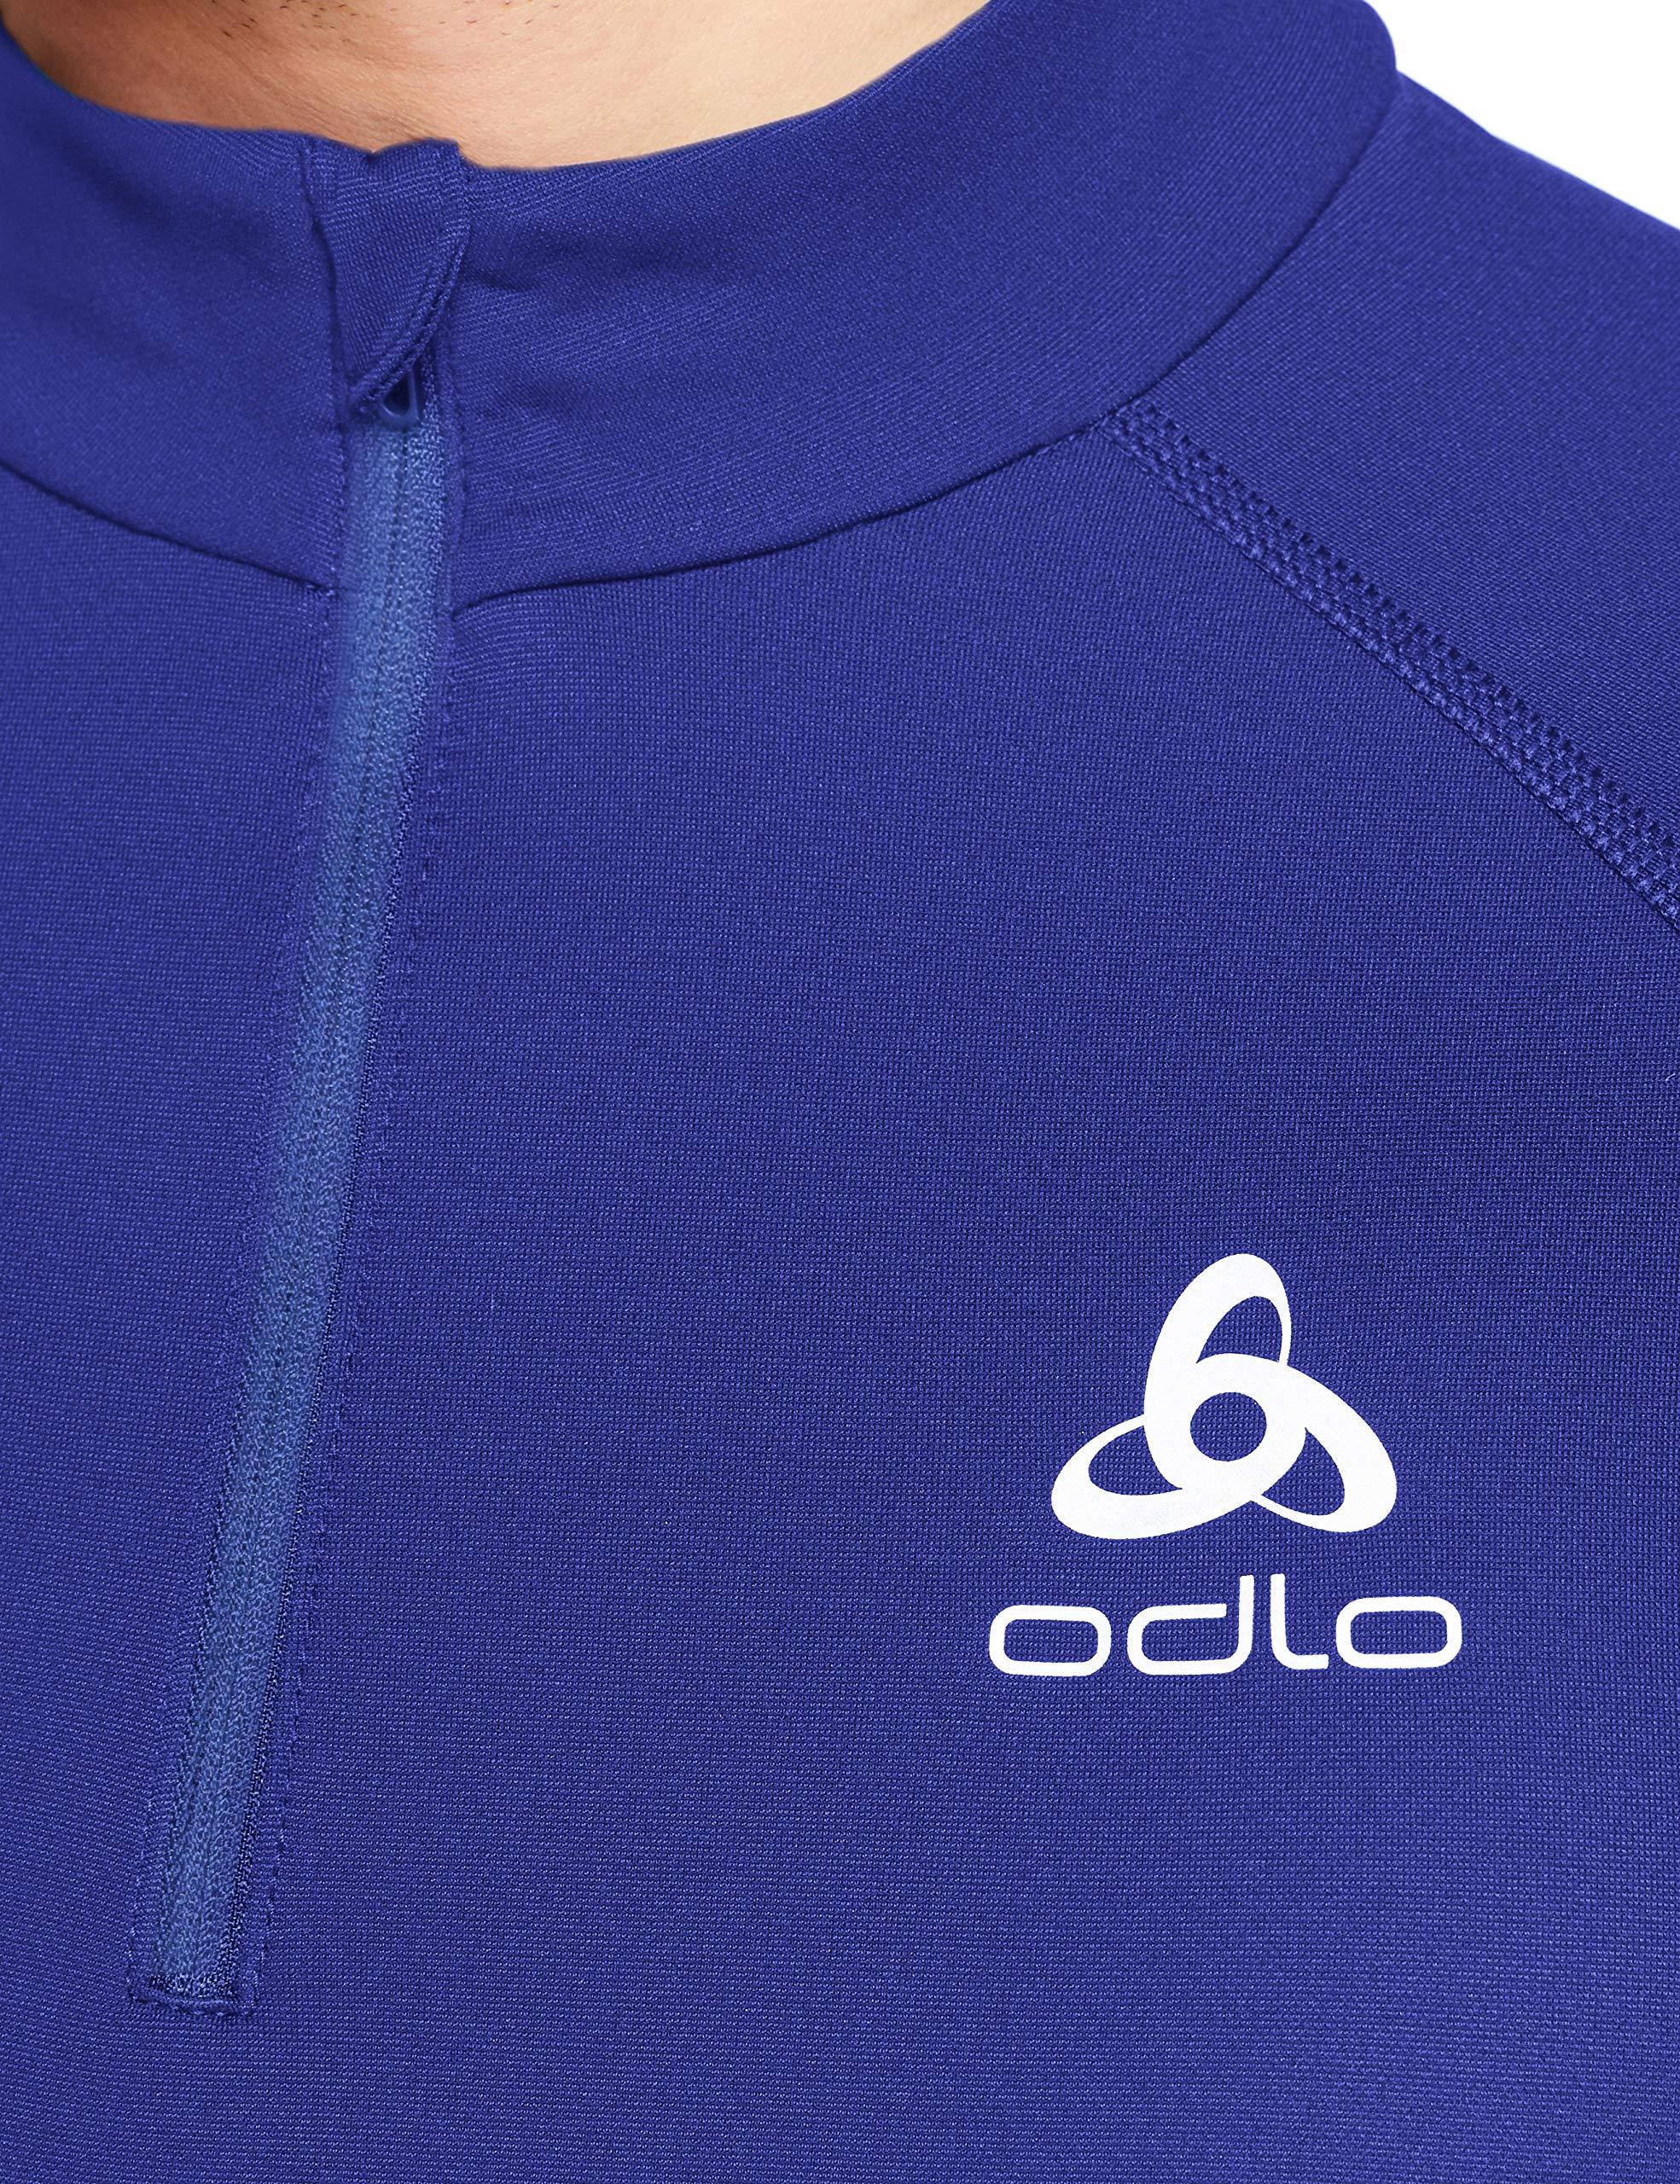 A13qri6LSiL - ODLO Men's Mid Layer 1/2 Zip Omnius Warm Pullover